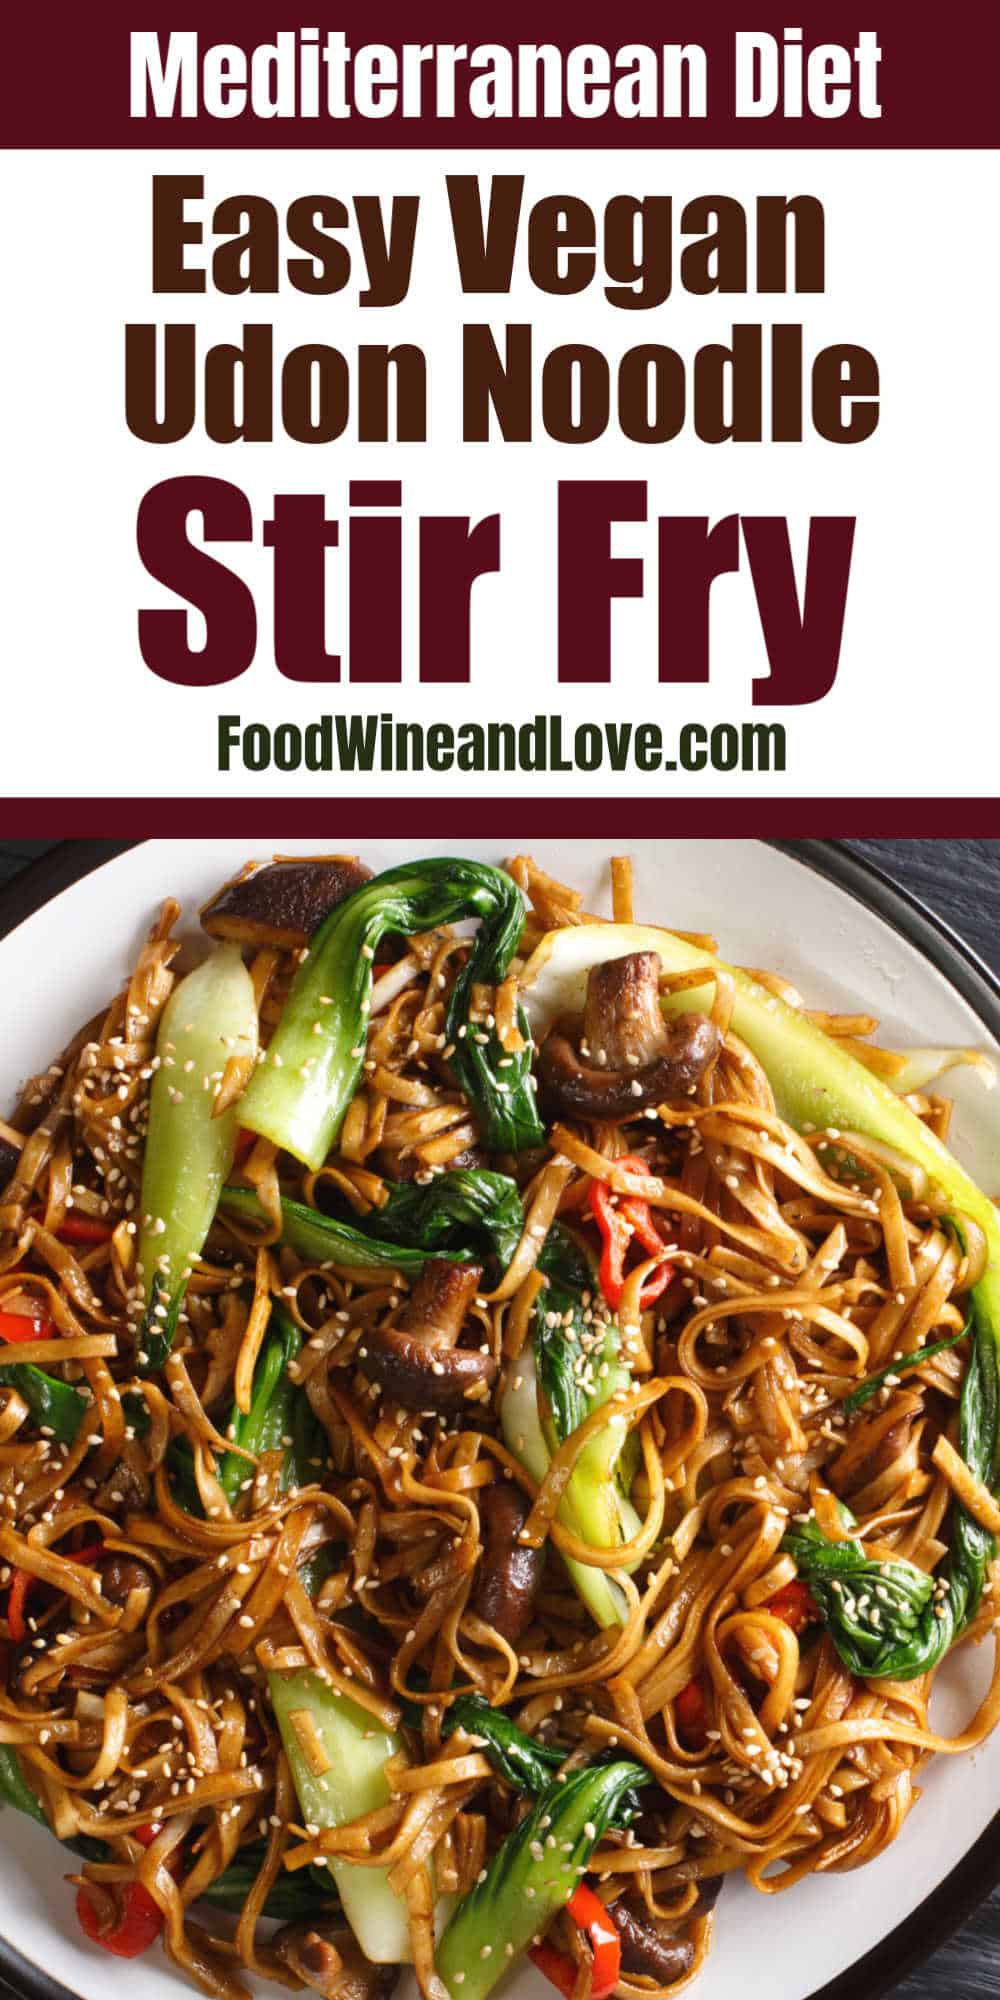 Vegan Udon Noodle Stir Fry